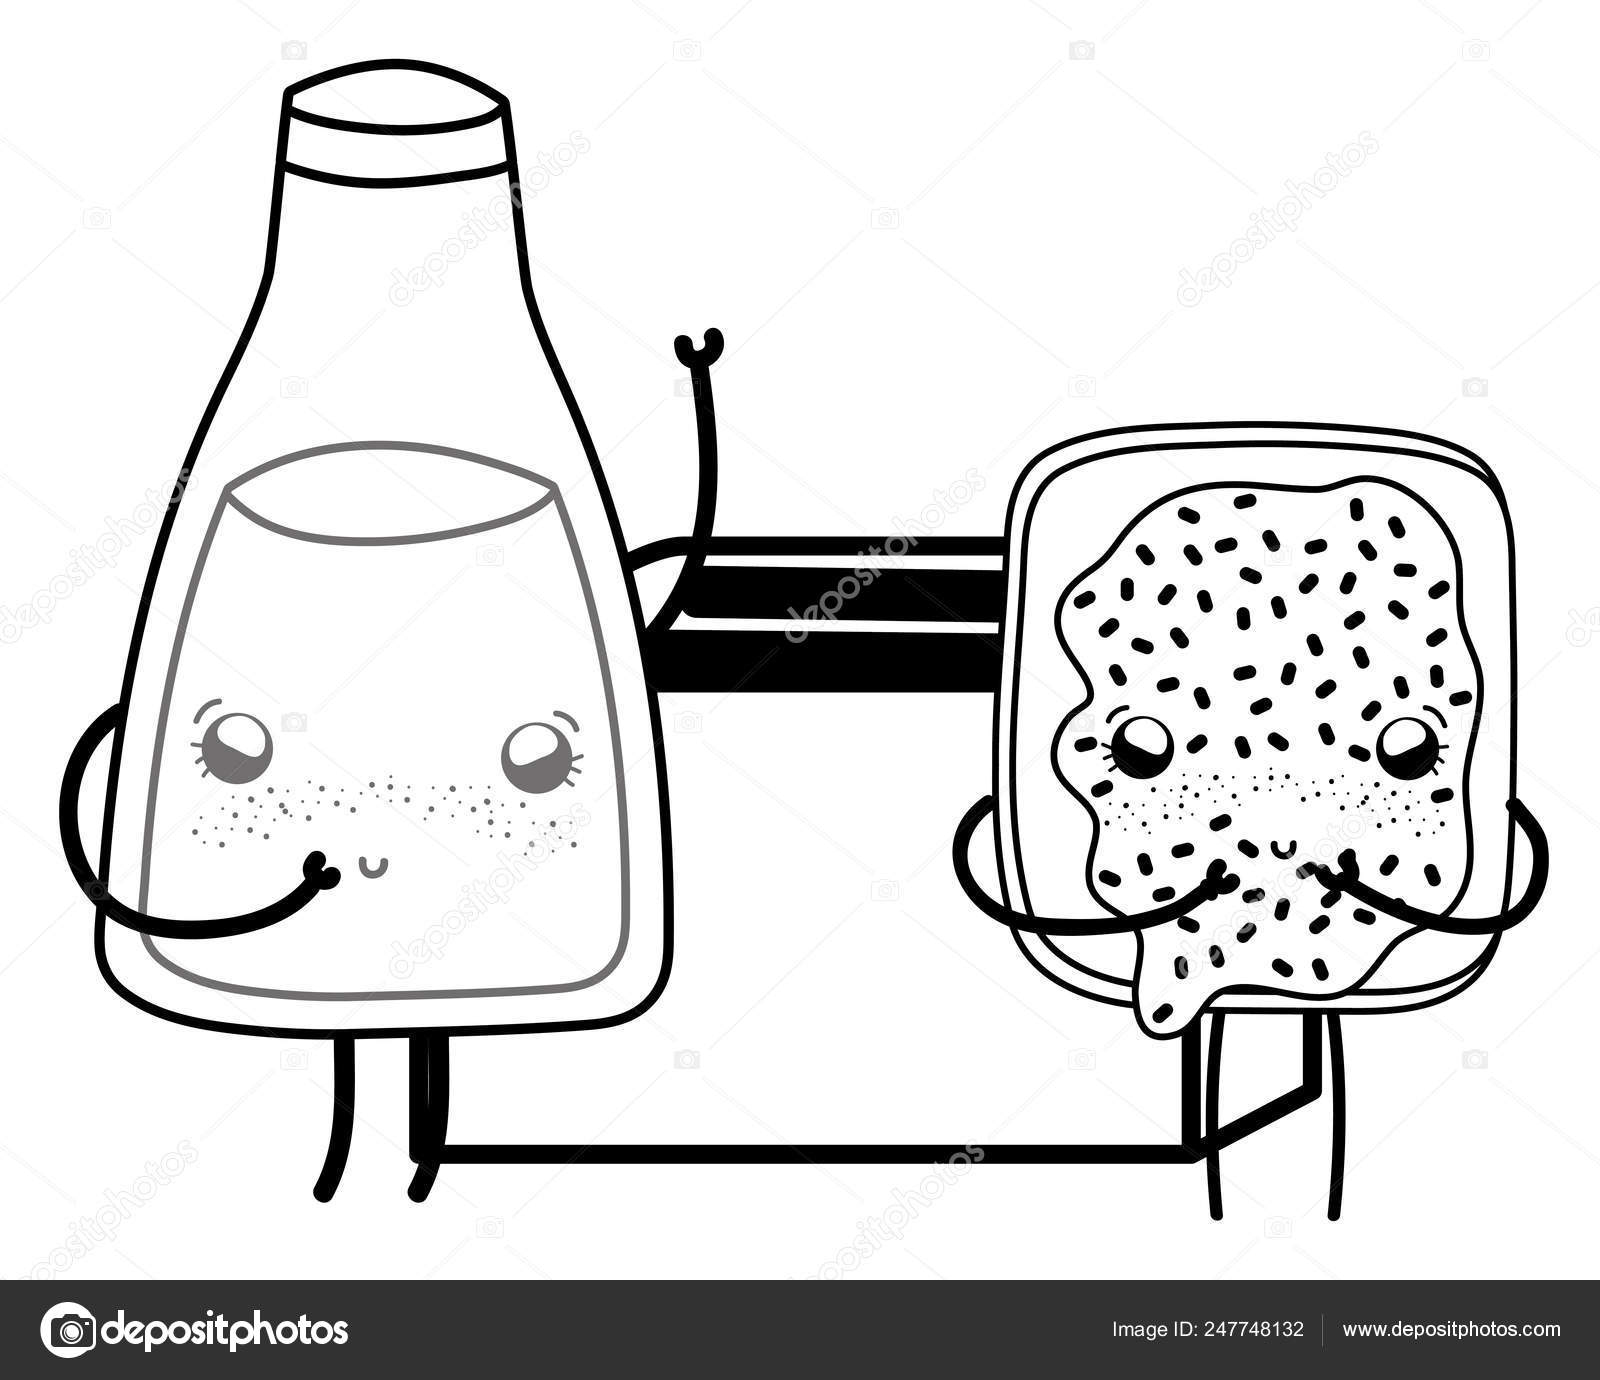 Kitchen Cute Cartoons Utensils Black And White Stock